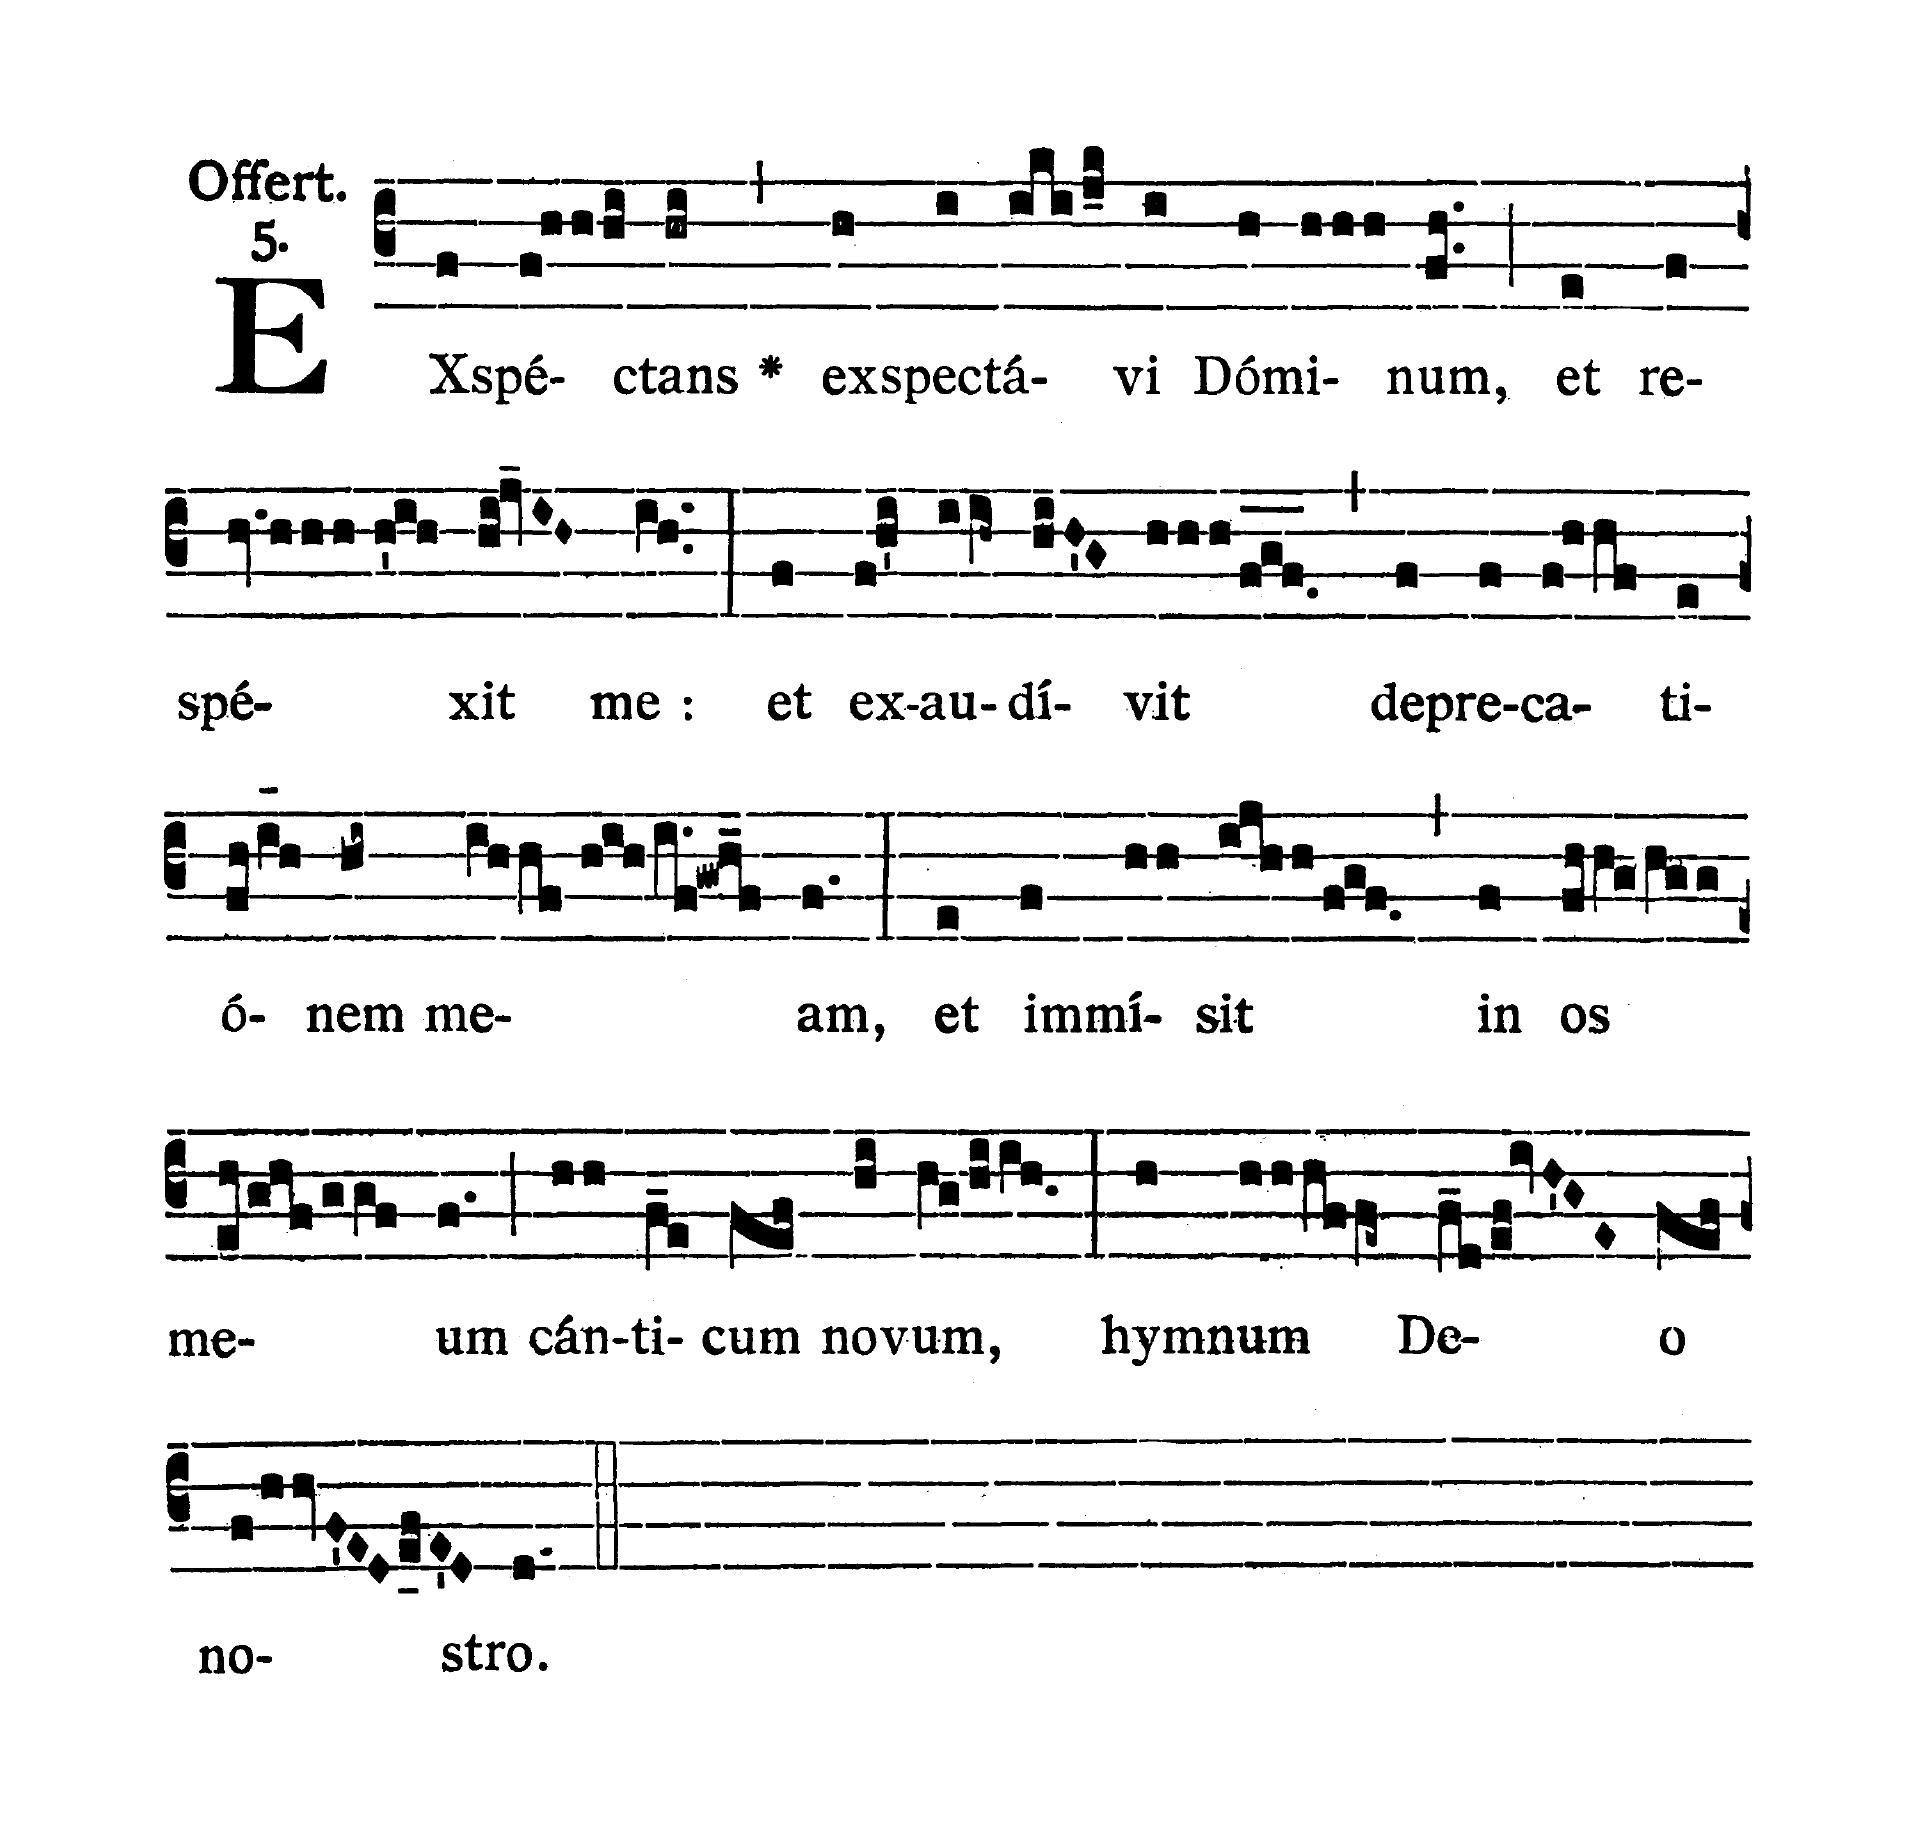 Feria III post Dominicam IV Quadragesimae (Wtorek po IV Niedzieli Wielkiego Postu) - Offertorium (Exspectans exspectavi)